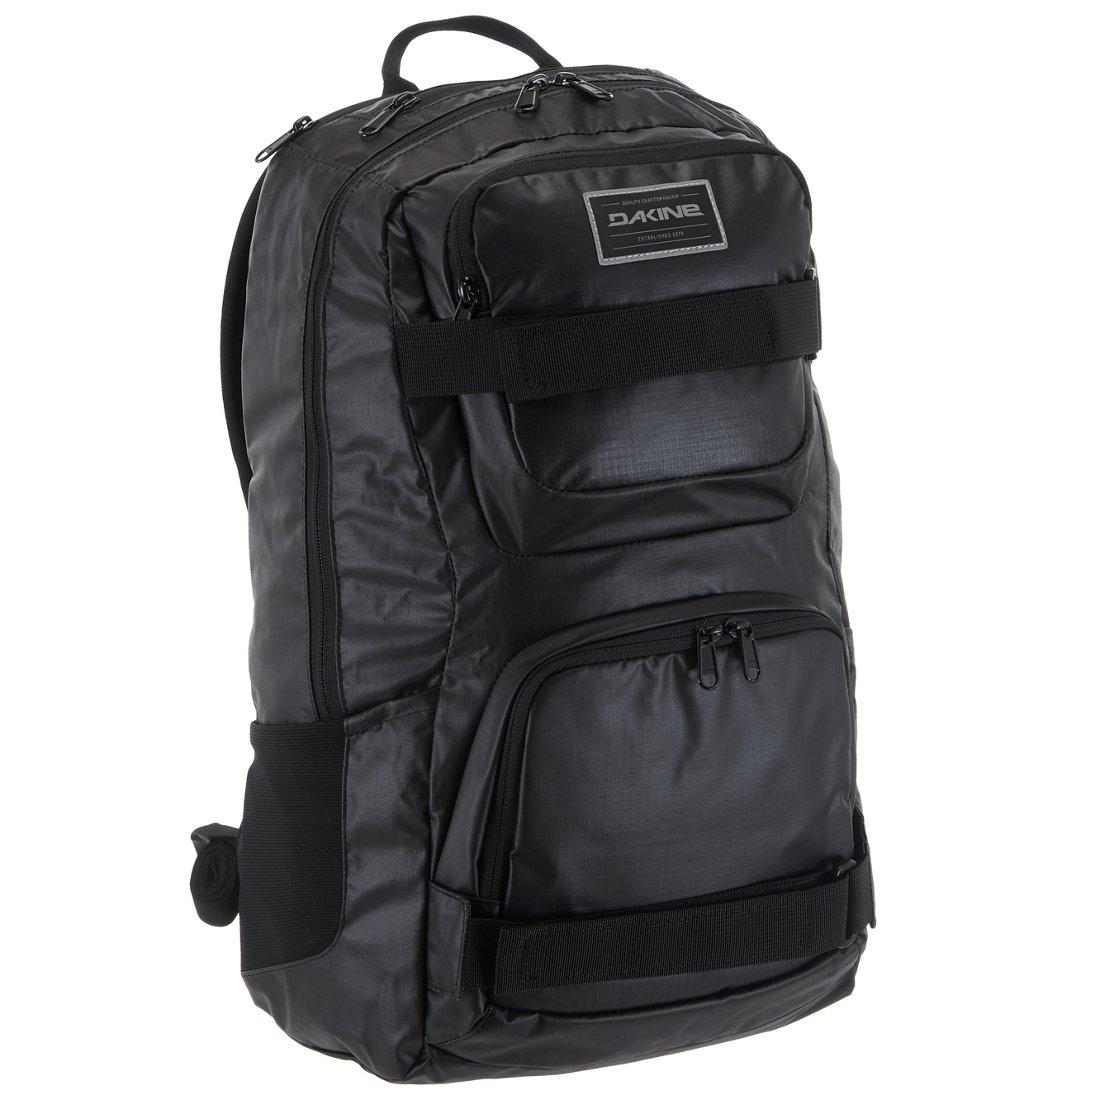 bd905b21a1231 Dakine Boys Packs Duel 26L Rucksack 48 cm - koffer-direkt.de